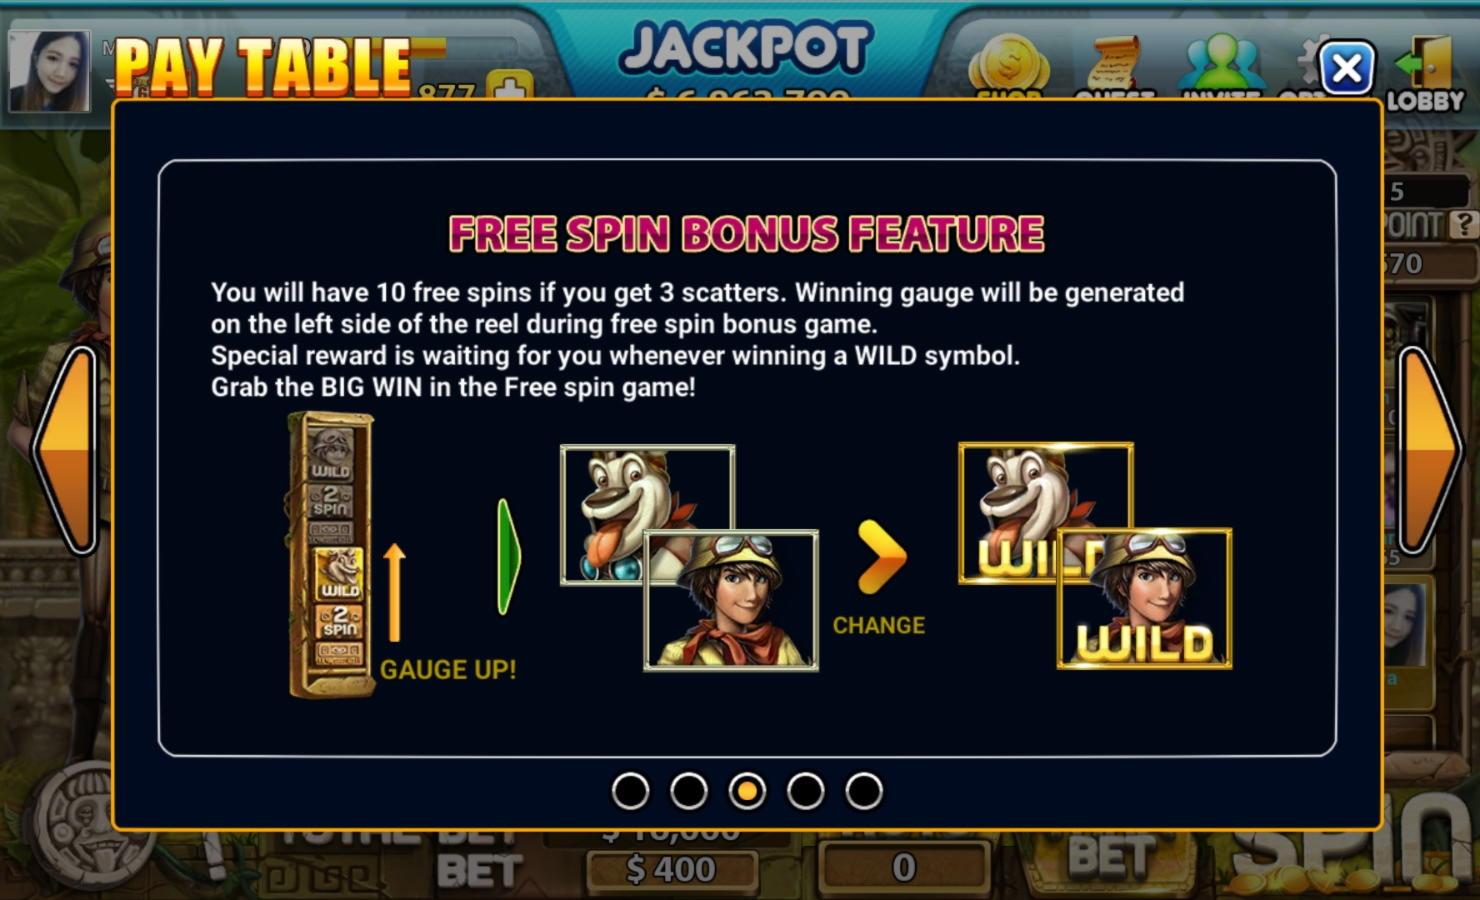 50% Bedste Tilmeldingsbonus Casino hos William Hill Casino